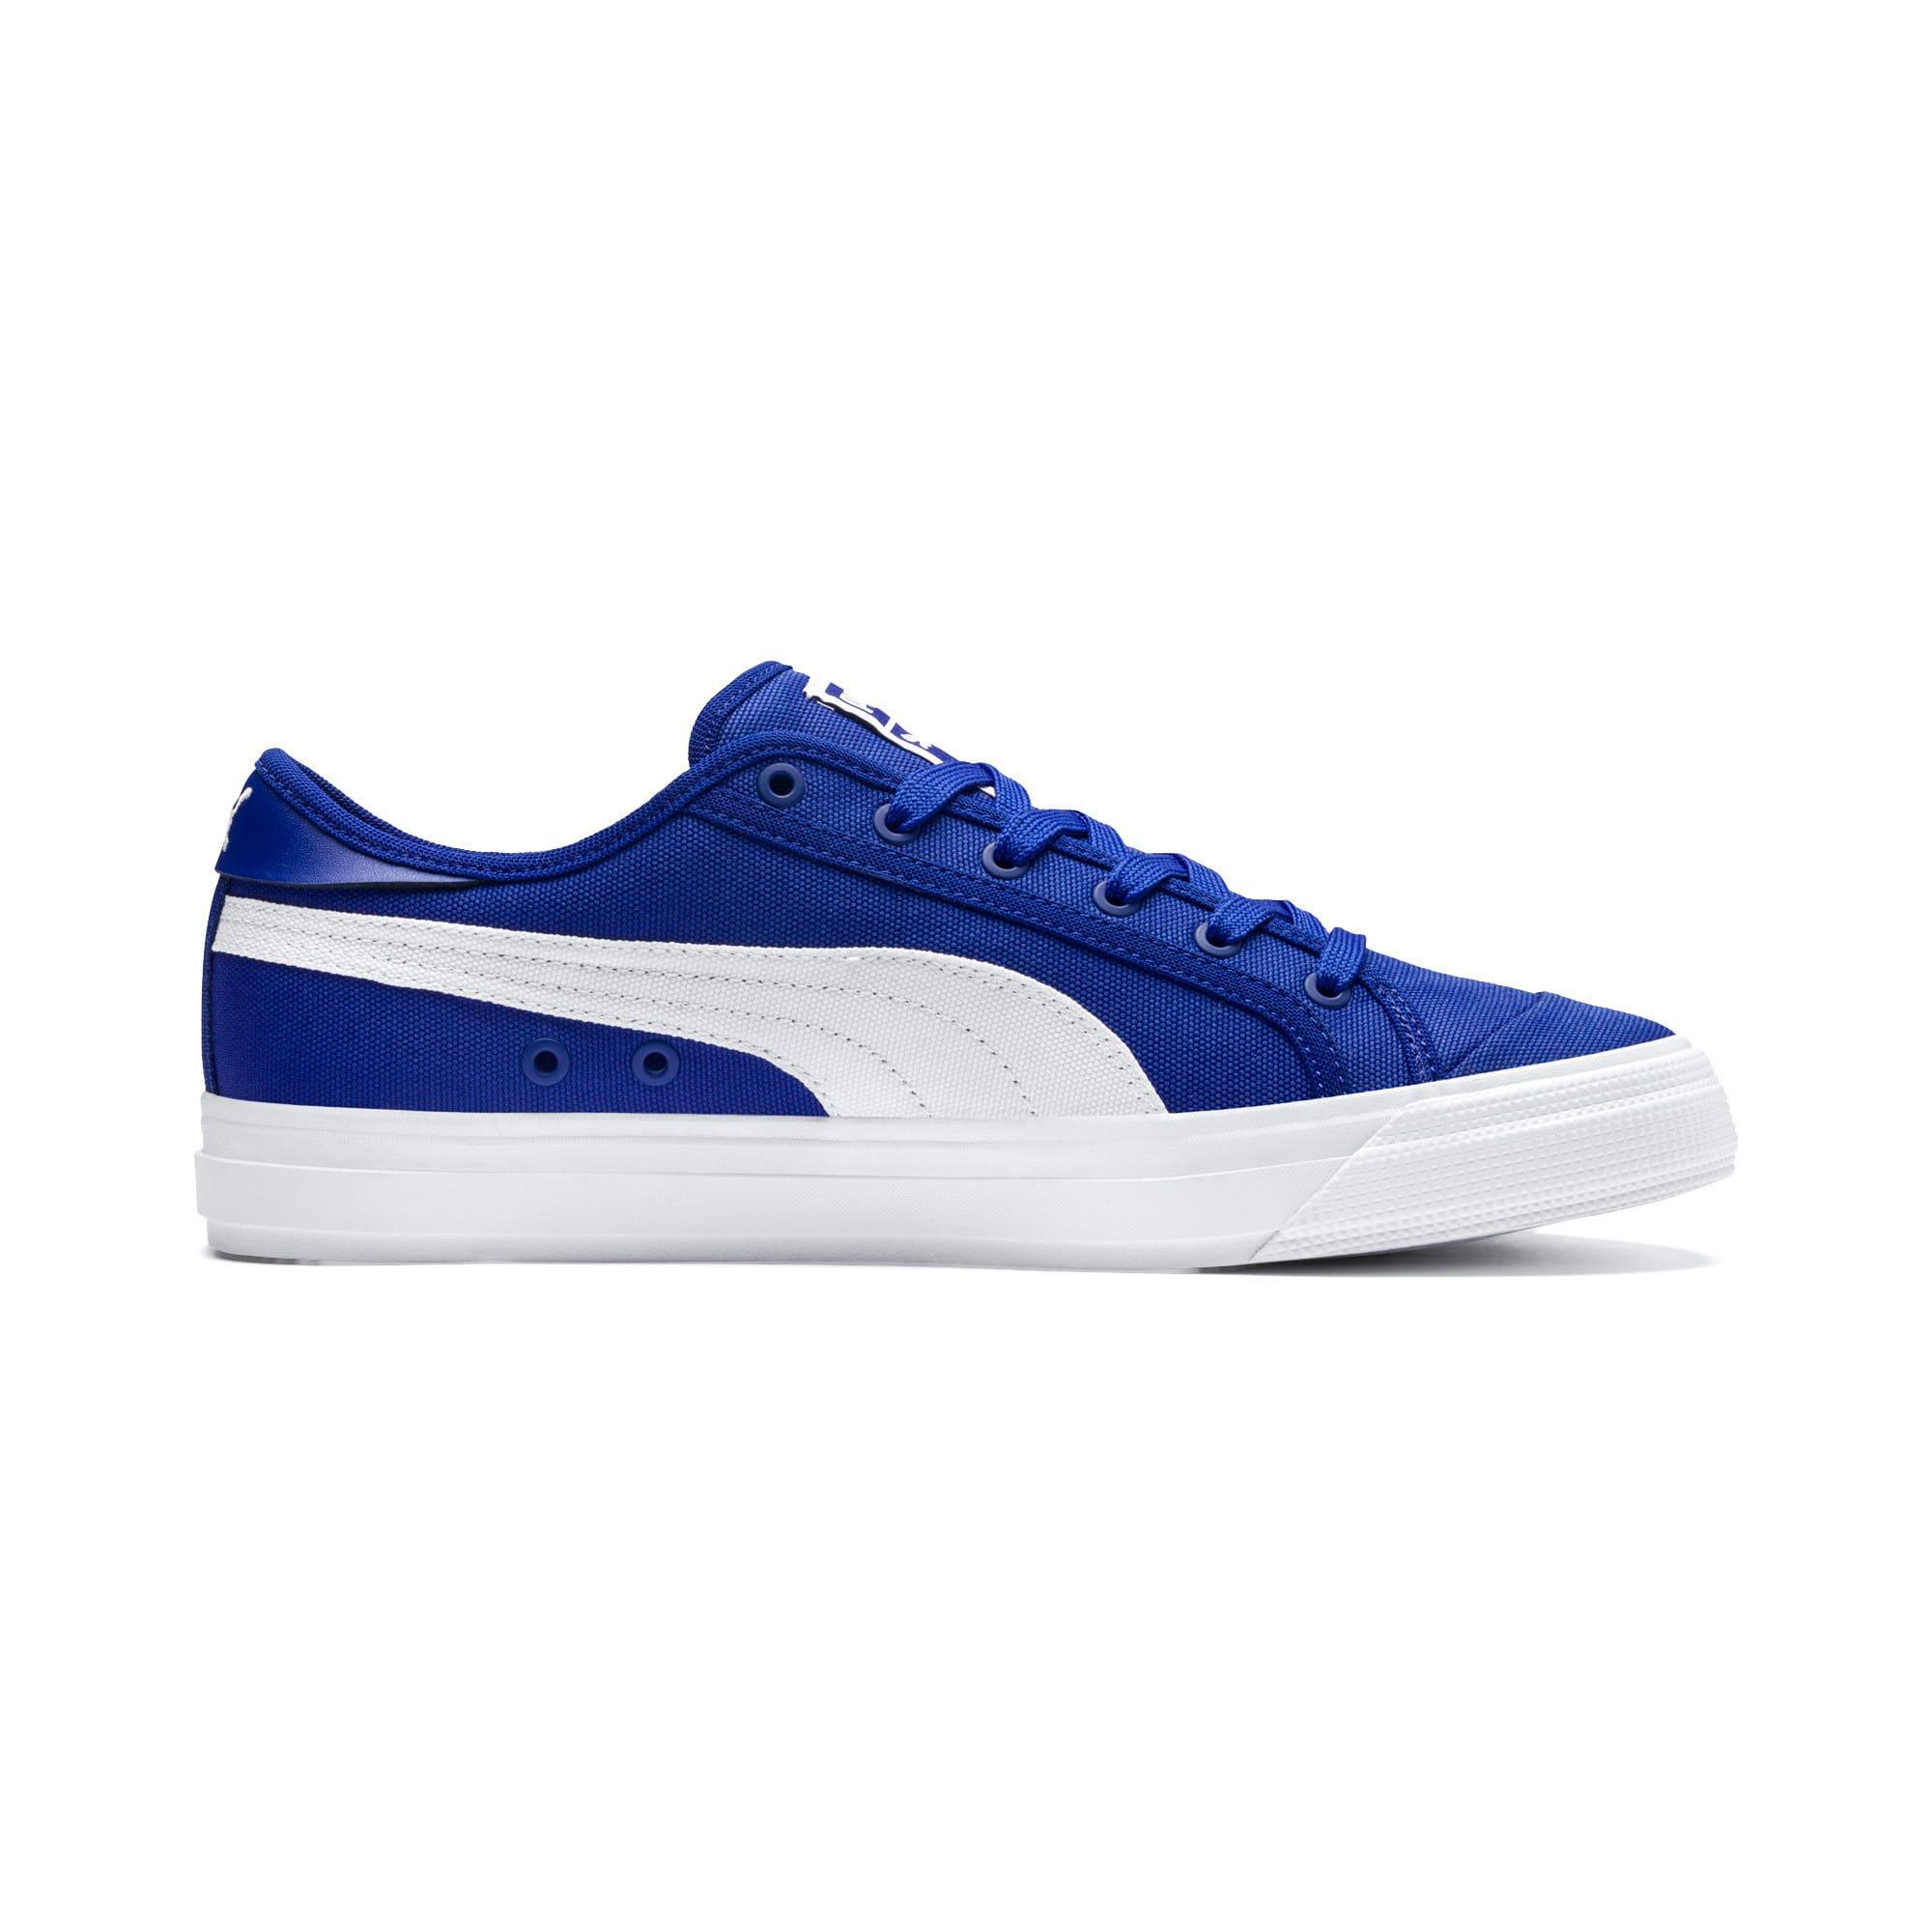 Thumbnail 5 of Capri Tennis Shoes, Surf DWeb-Puma Wht-Puma Wht, medium-IND